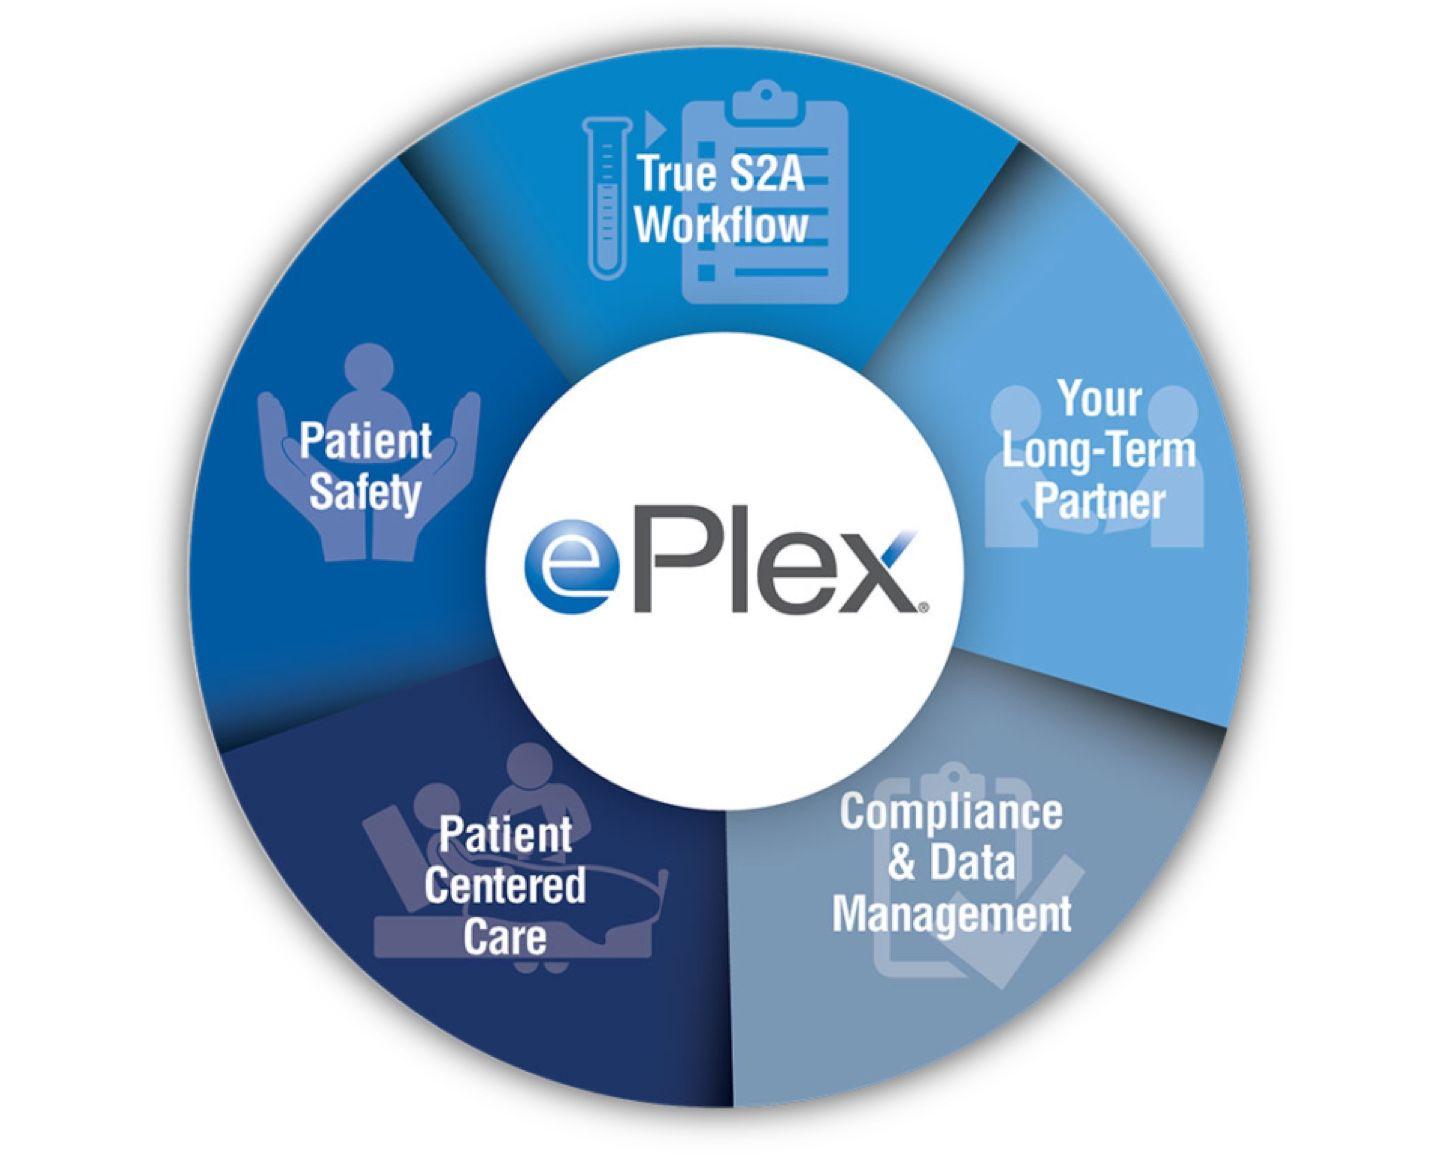 ePlex system integration